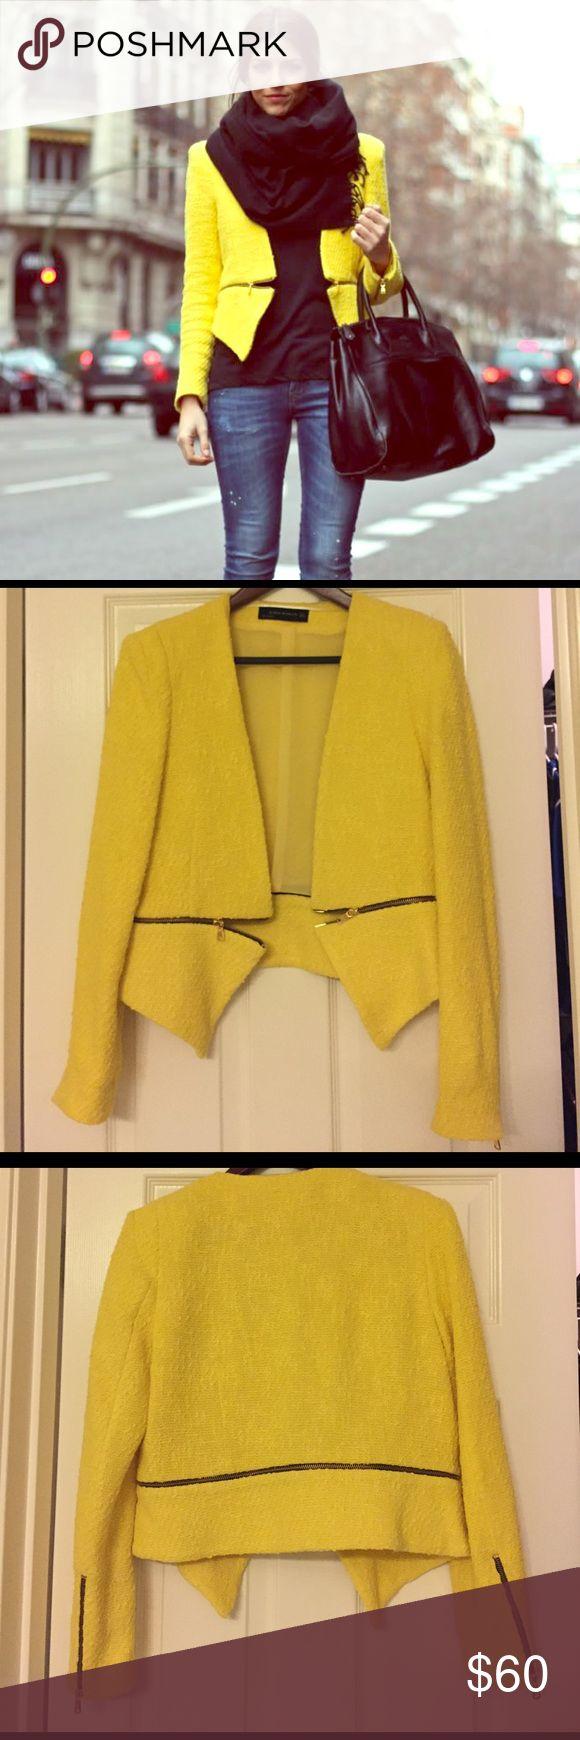 ⭐️ EUC Zara Yellow Zipper Blazer ⭐️ Zara Zipper Women Blazer. Amazing zipper details on the sleeves and around the waist line. Worn a handful of times in perfect condition. This item is definitely an outfit maker. Zara Jackets & Coats Blazers